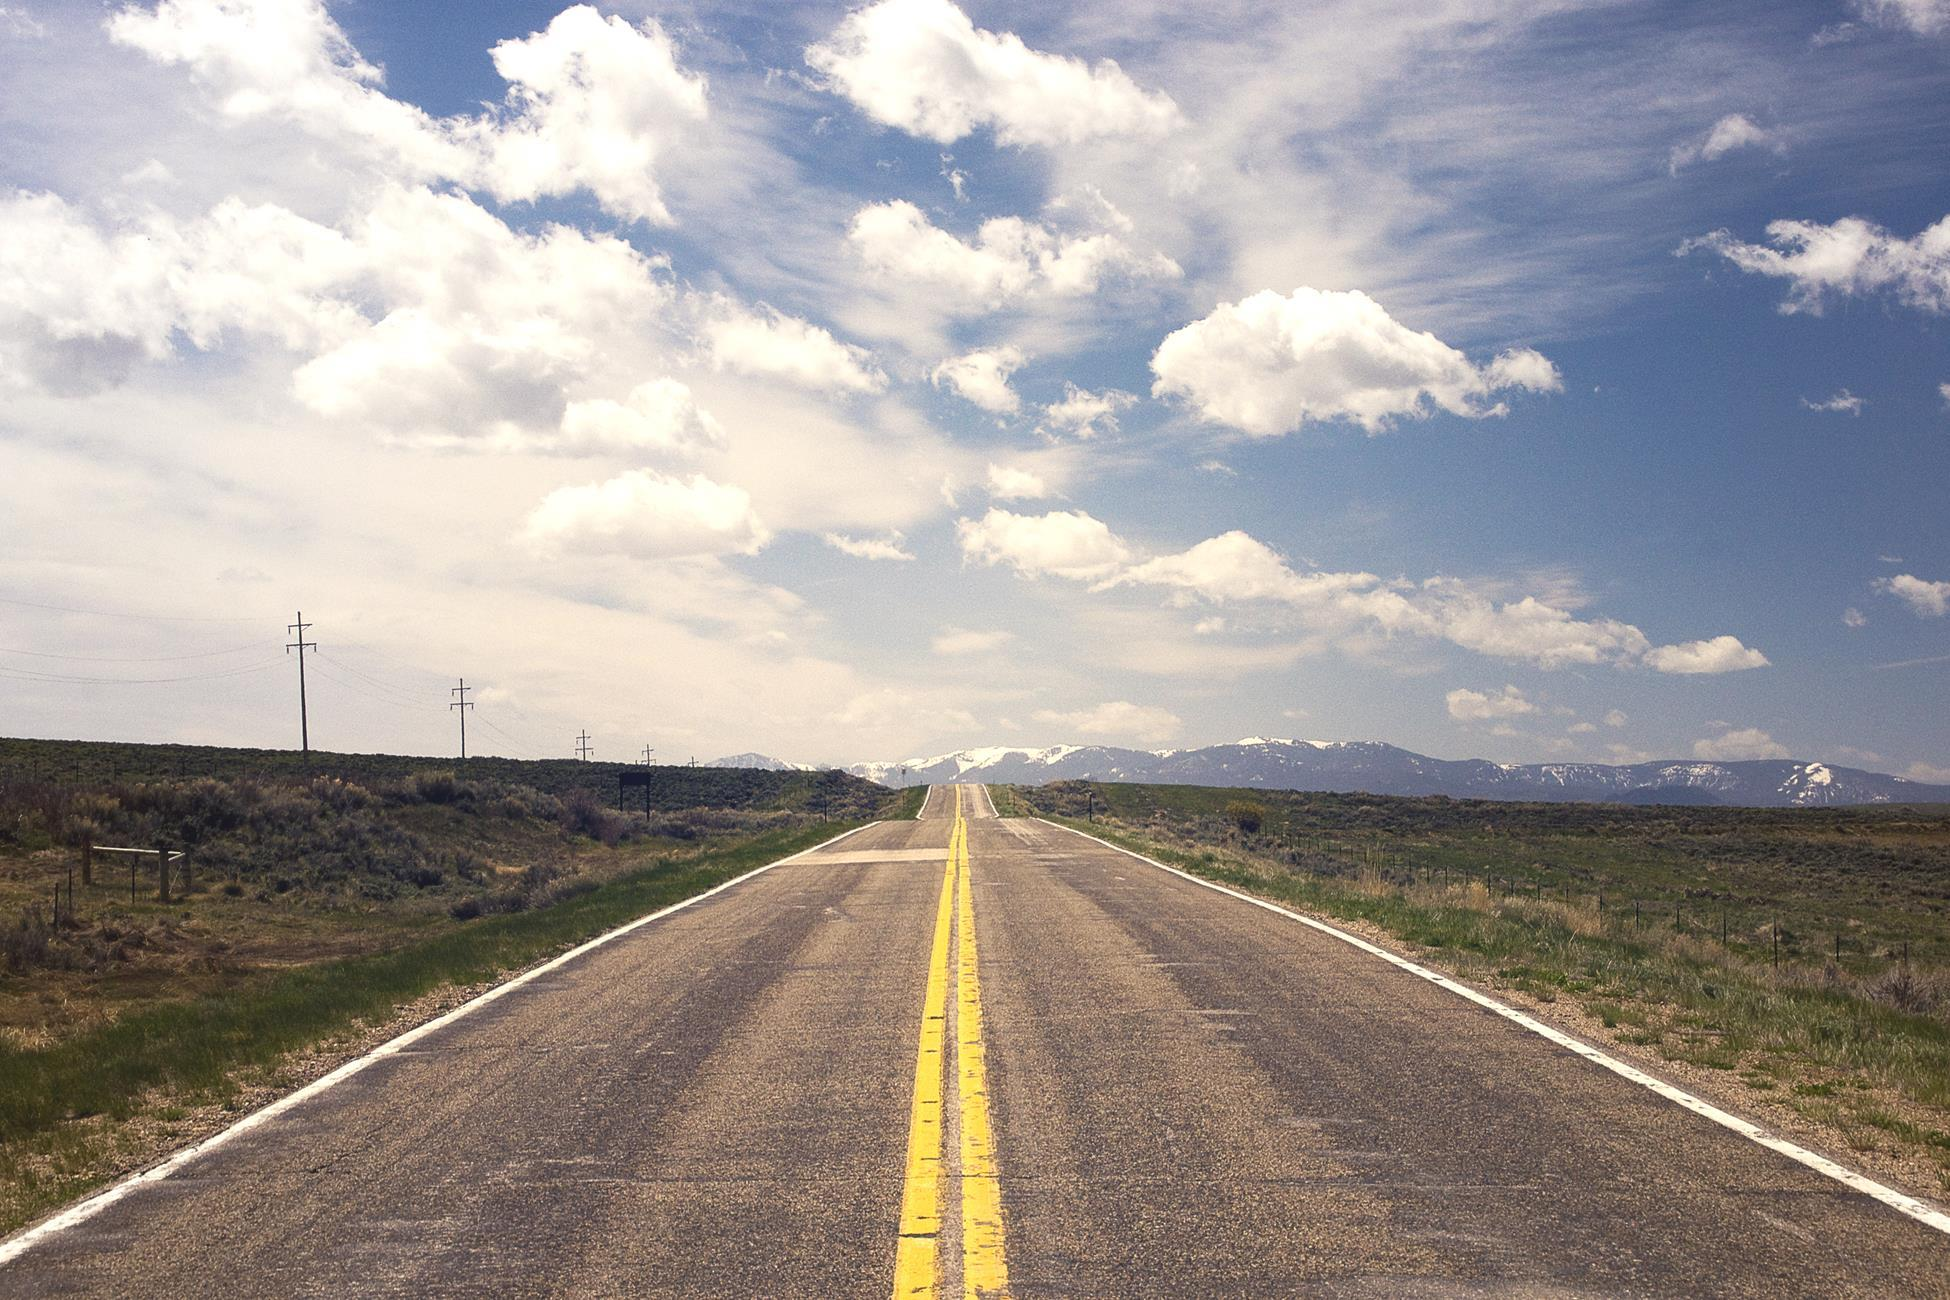 Road sky clouds horizon long-term distance